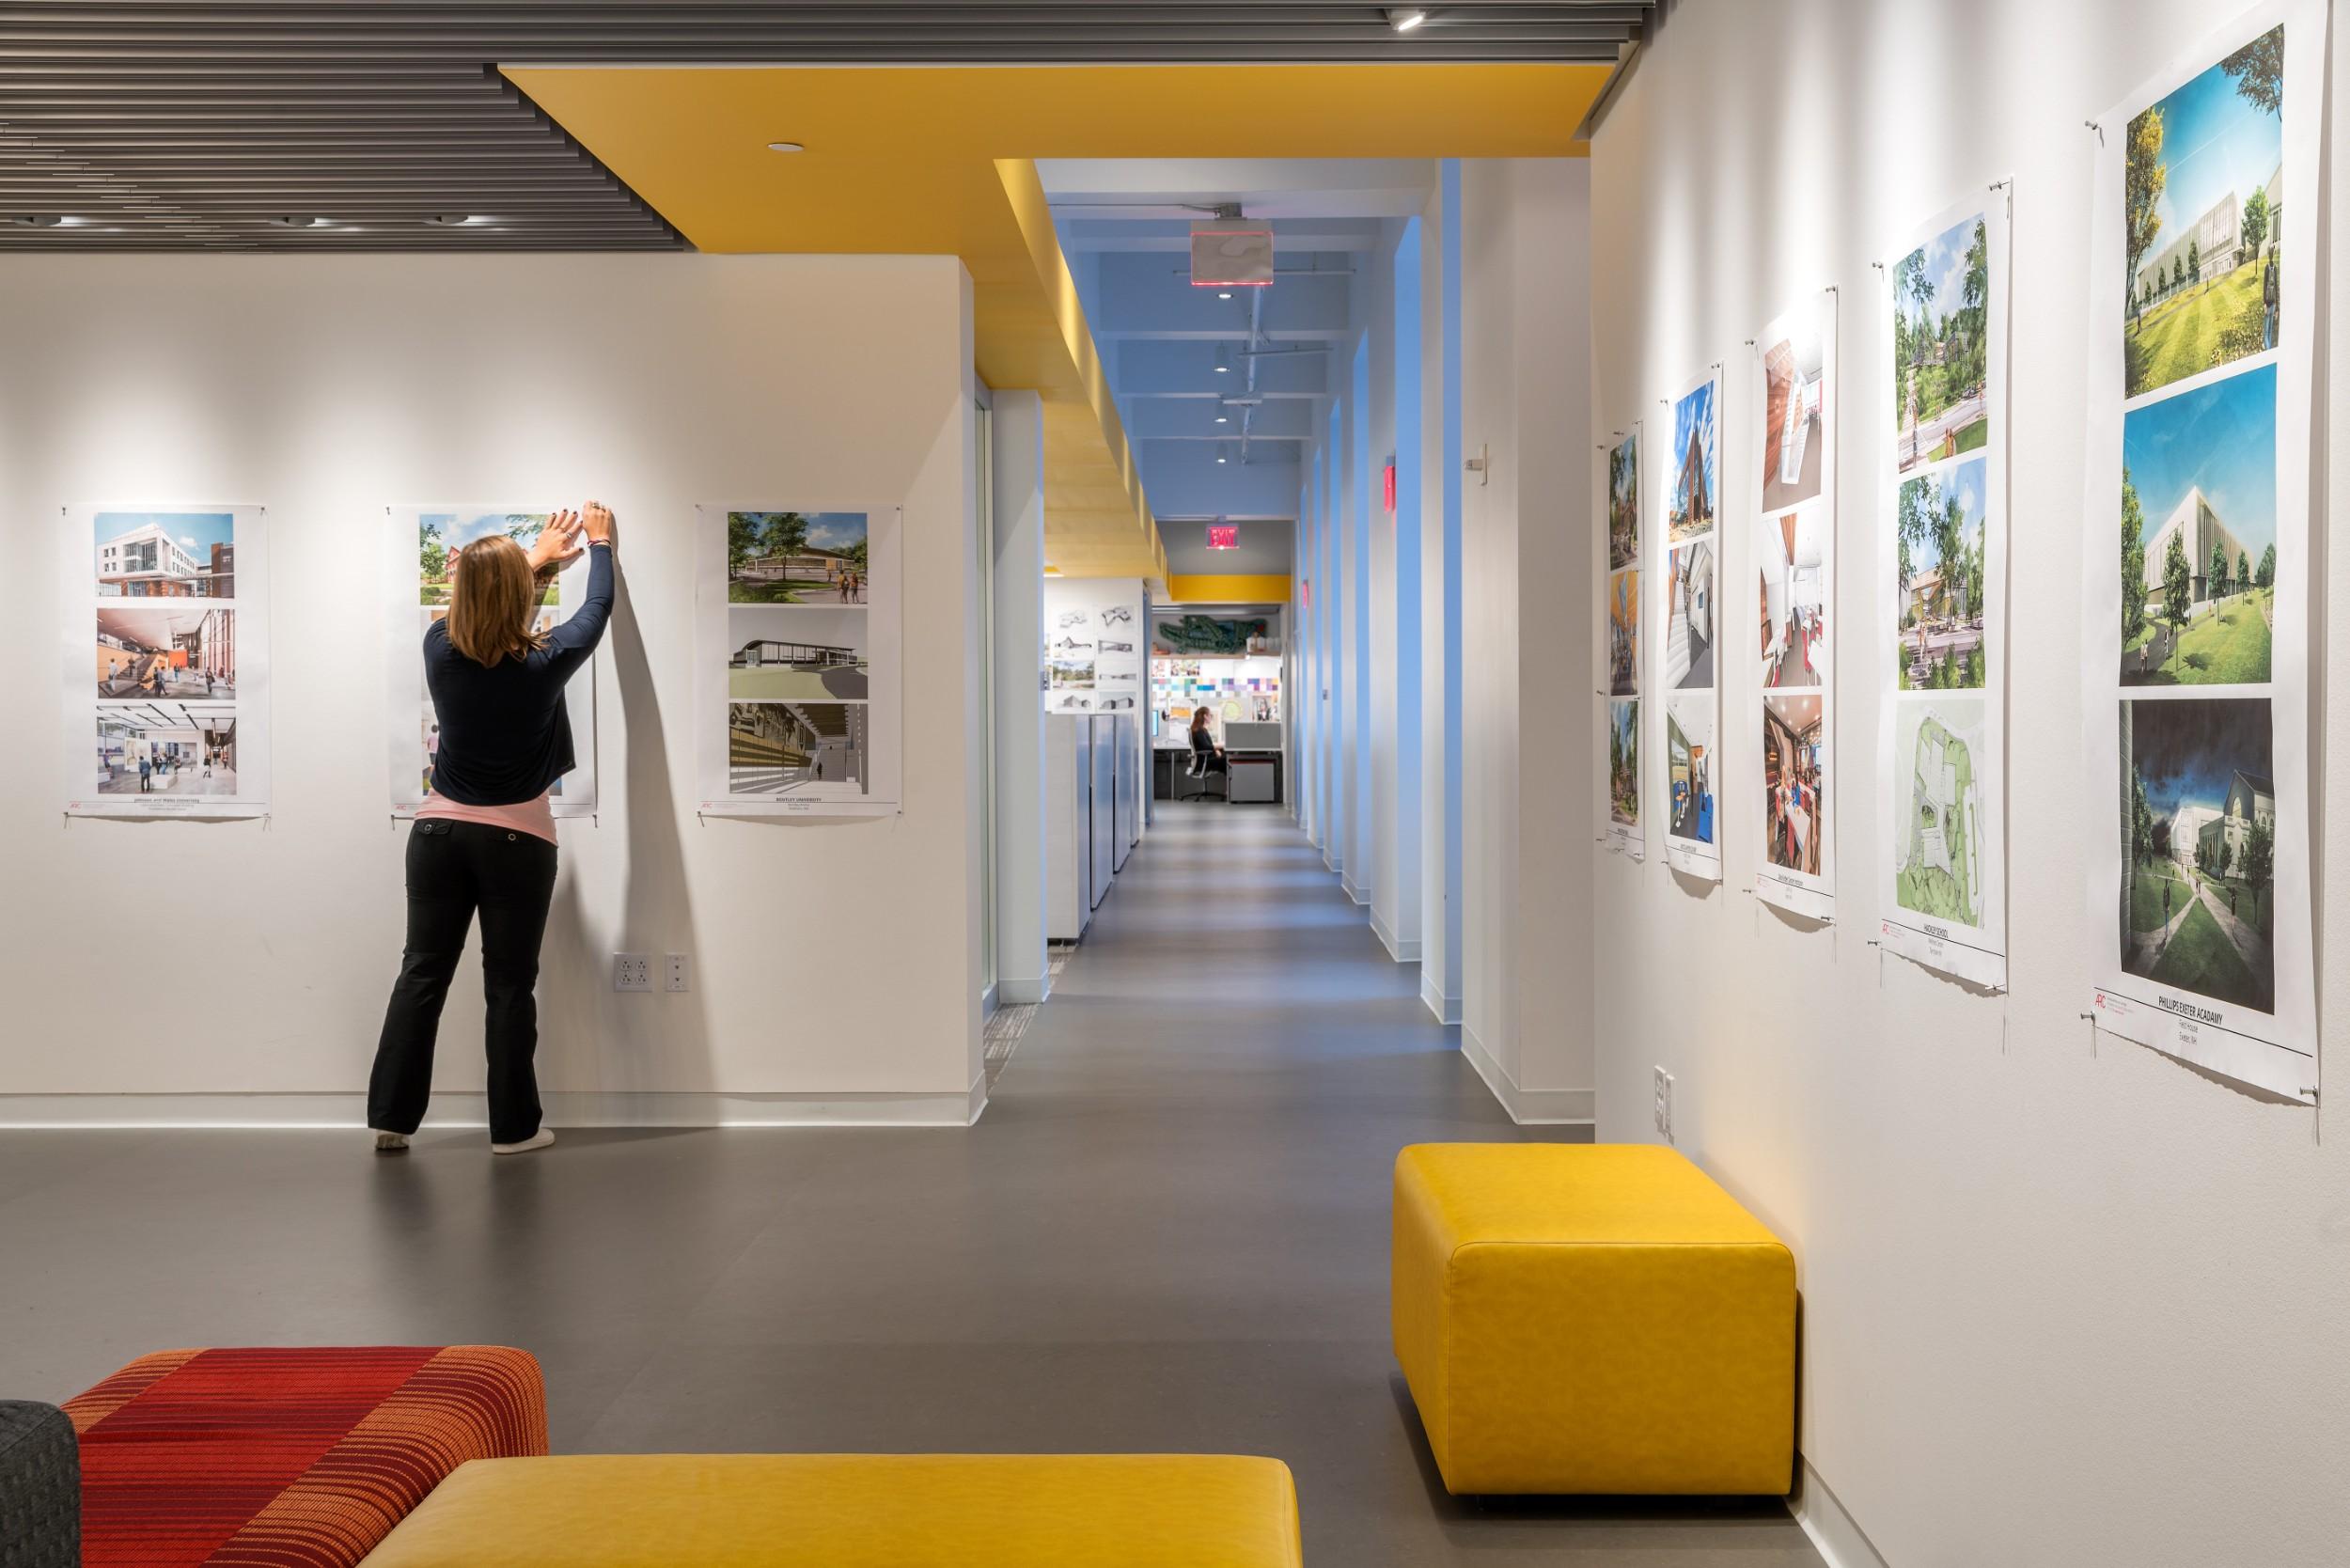 ARC_Architectural_Resources_Cambridge_Boston_Office_Back_Bay_Corderman_Construction_Office.jpg